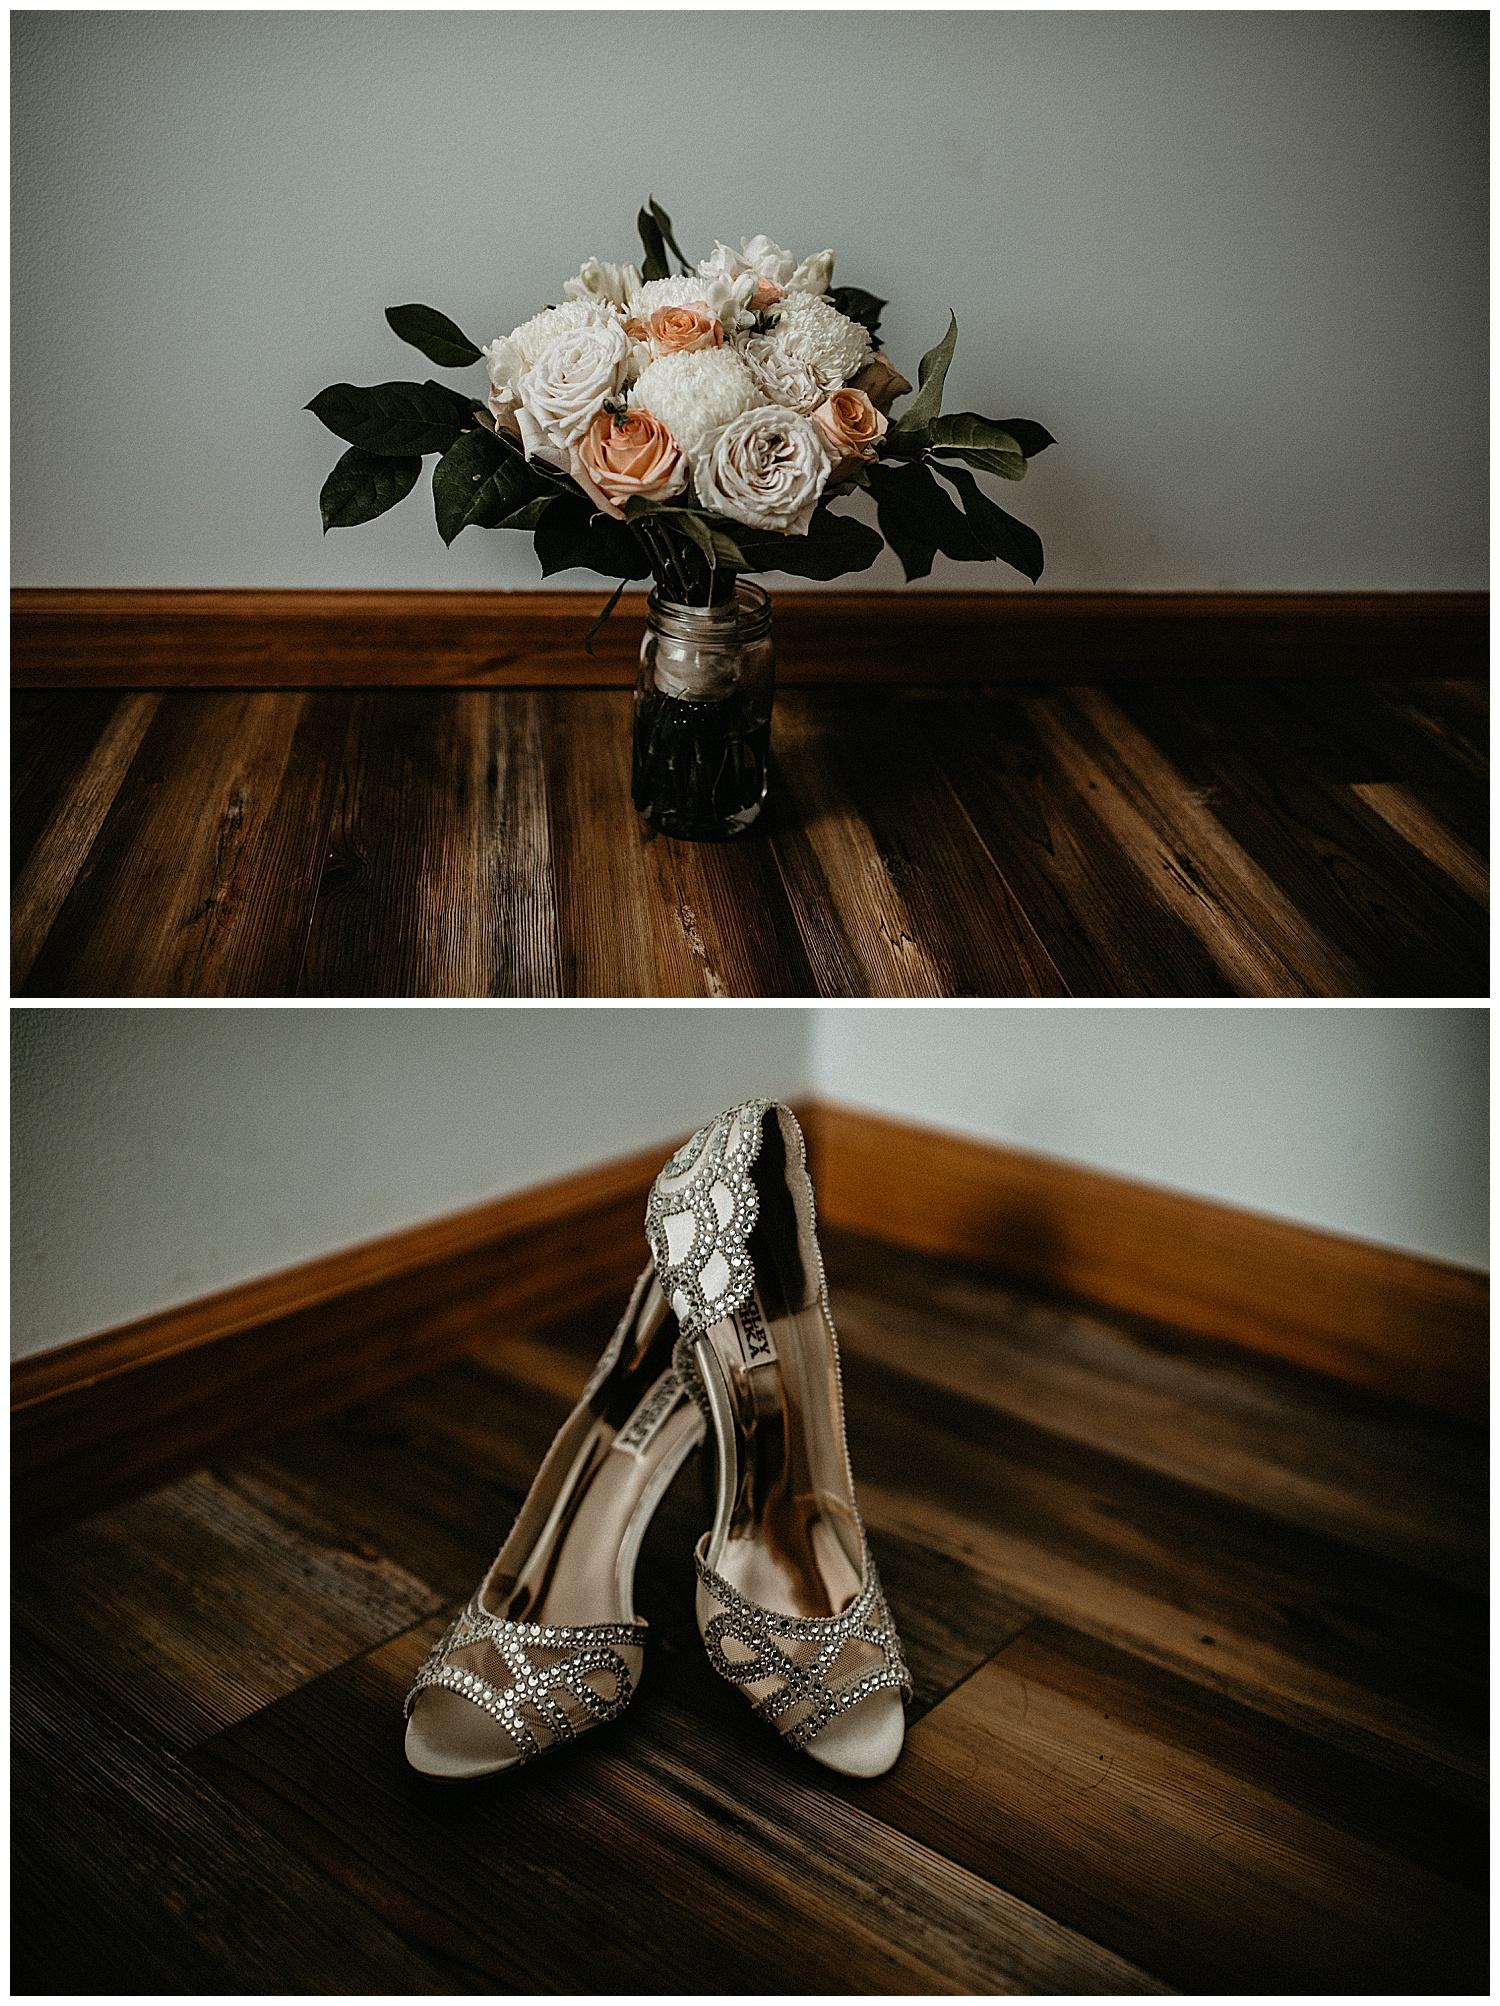 NEPA-Lehigh-Valley-Wedding-Photographer-at-Fountain-Springs-Country-Inn-Ashland-PA_0009.jpg